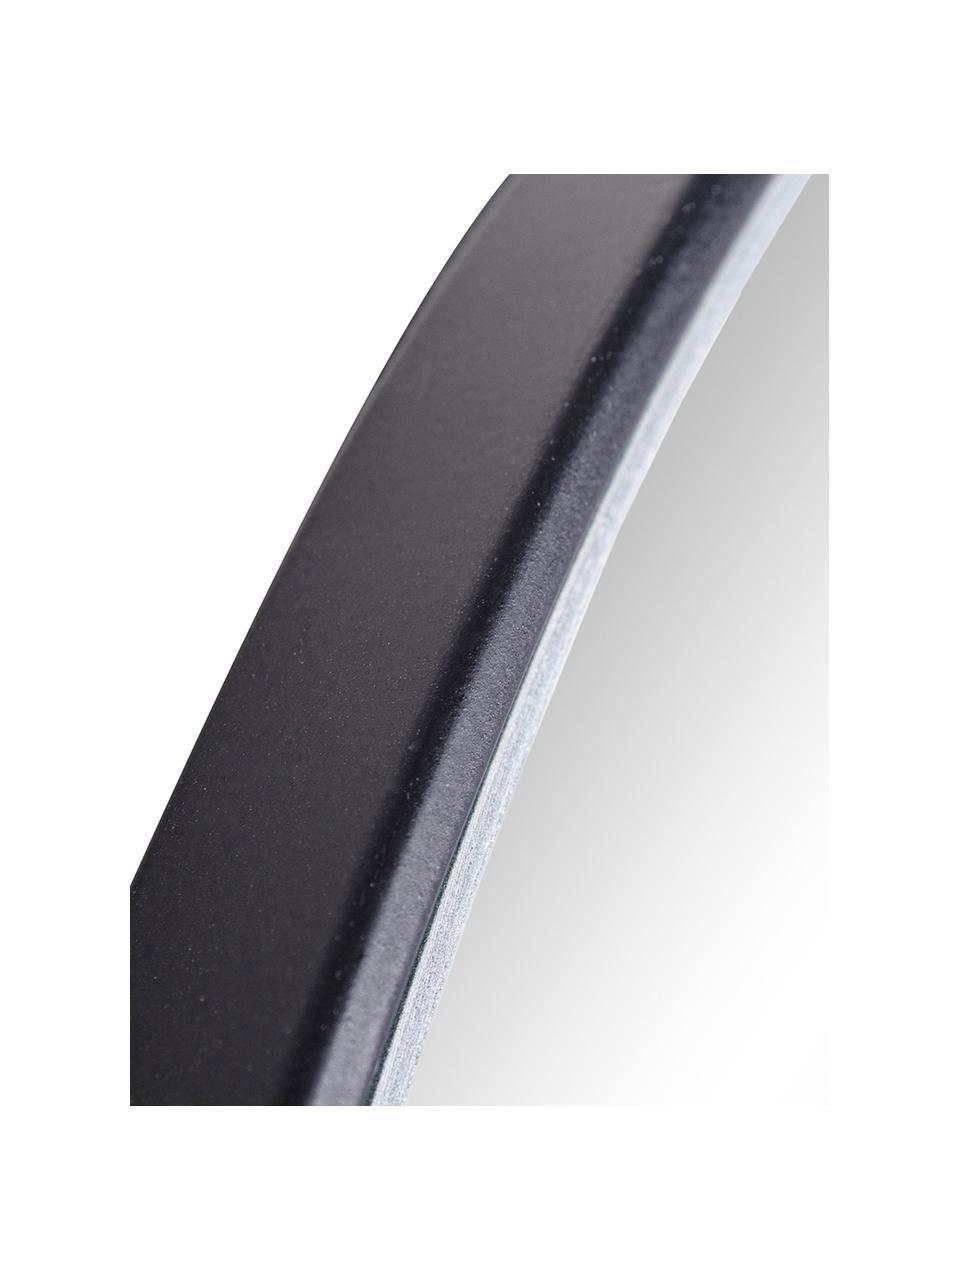 Okrągłe lustro ścienne Nucleos, Czarny, Ø 70 cm